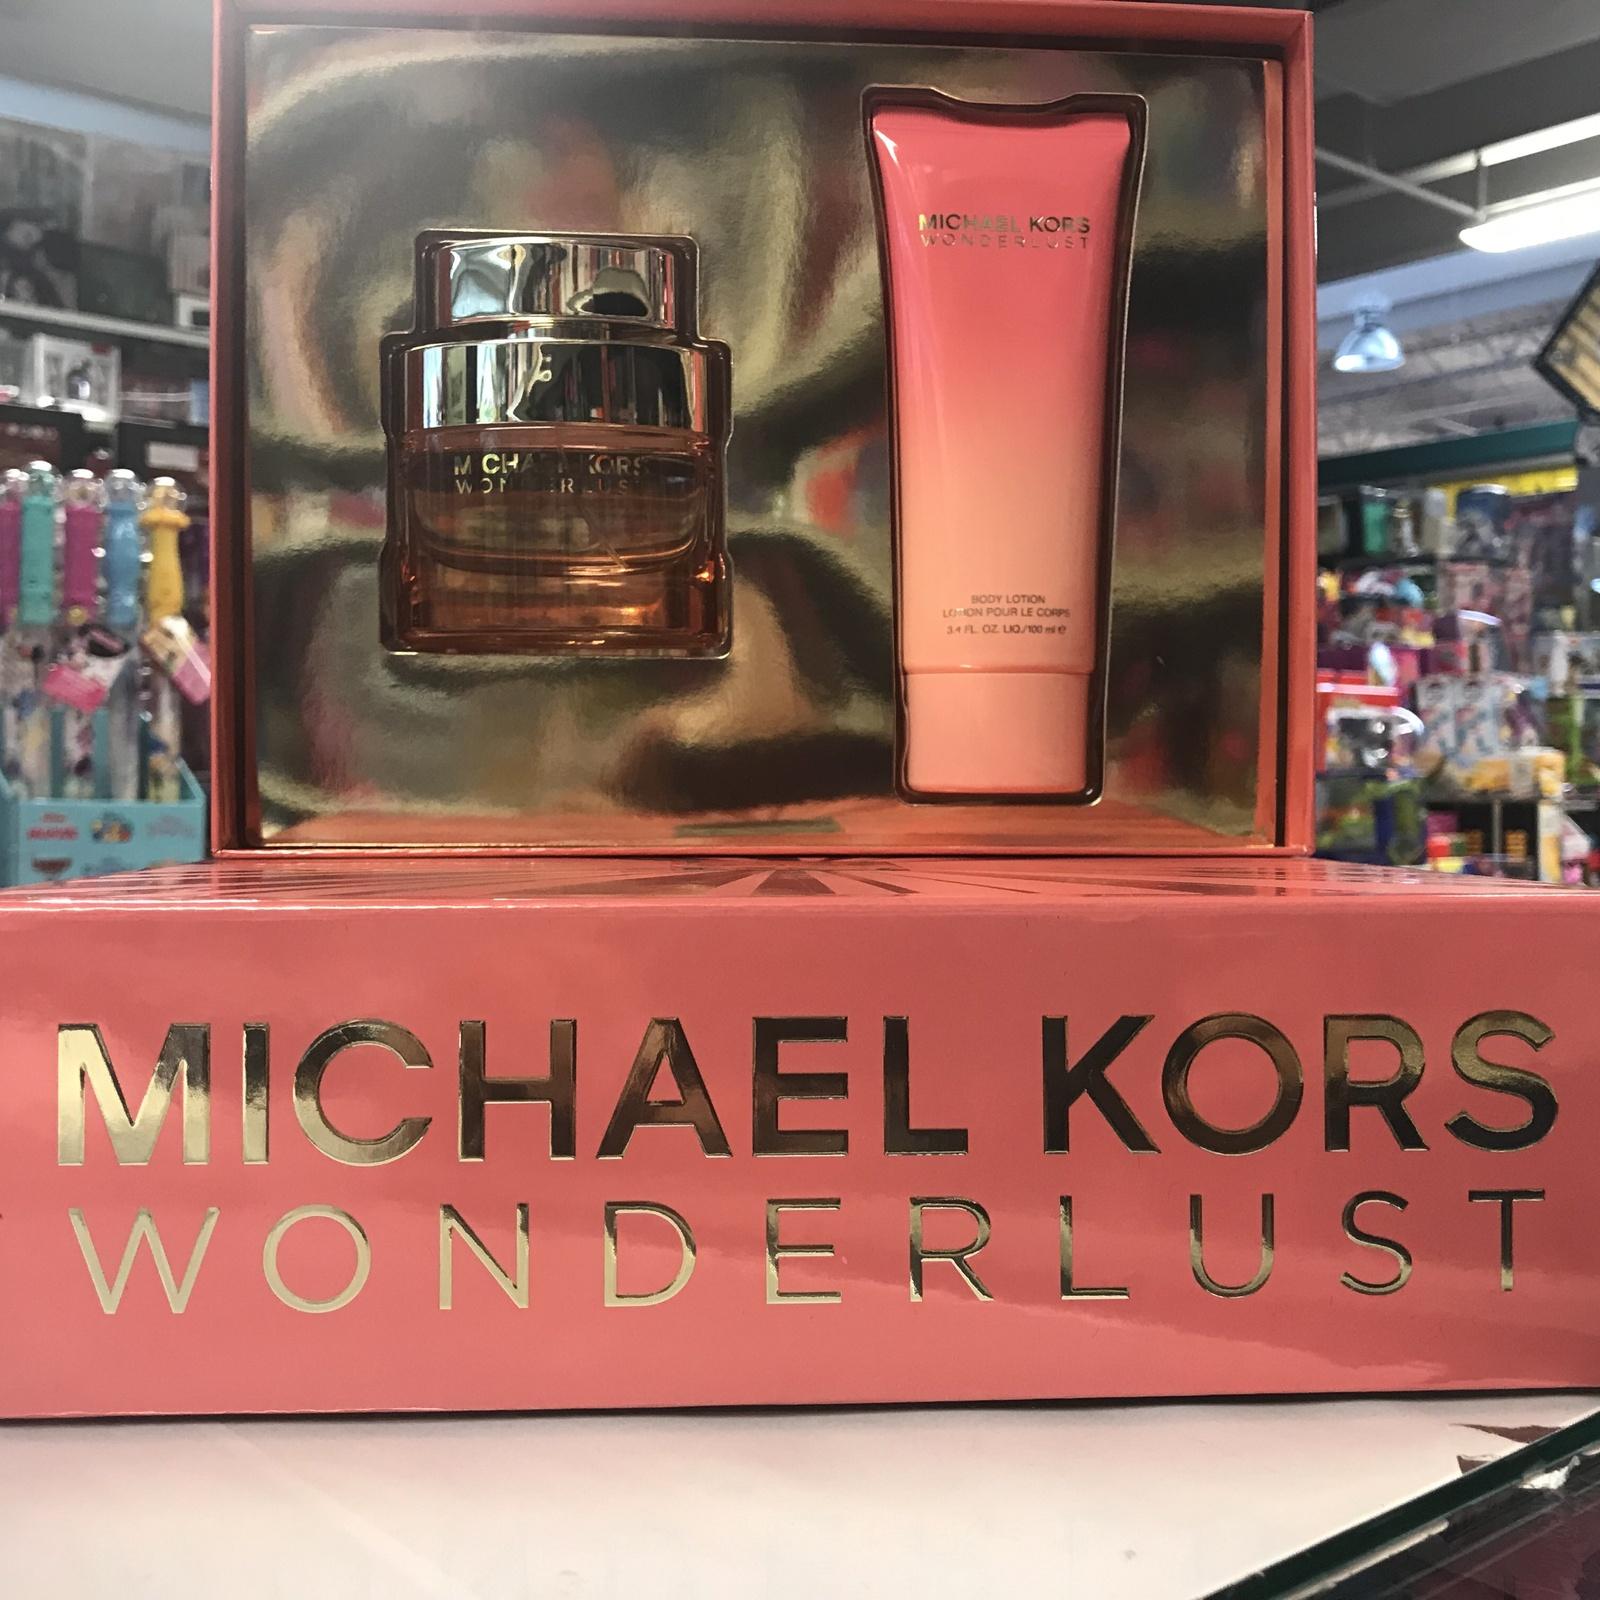 Michael Kors Wonderlust 2Pcs Women Set, 1.7 oz + 3.4 oz Body Lotion